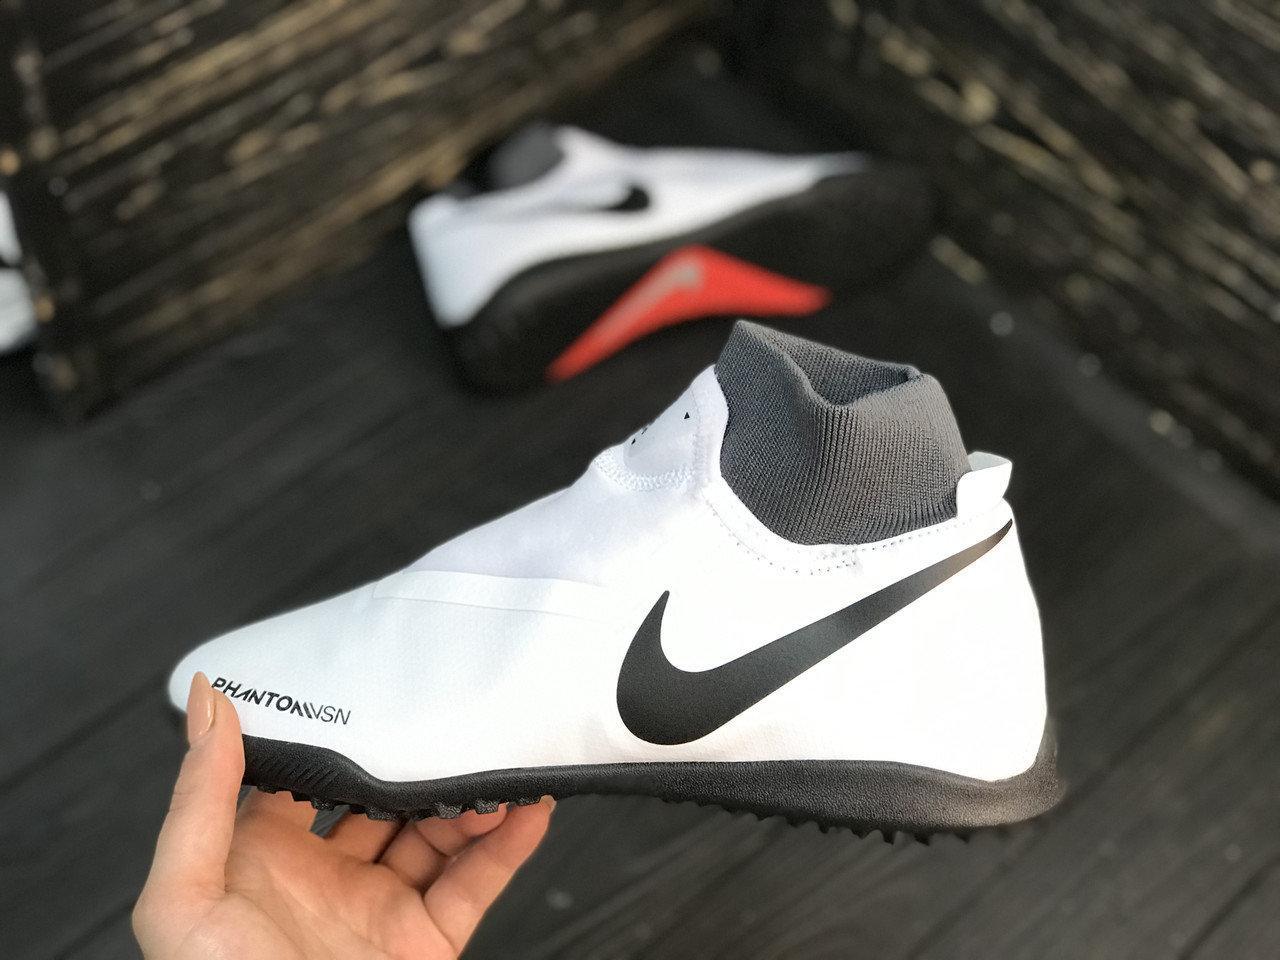 Сороконожки Nike Phantom VSN с носком / (реплика) /44/